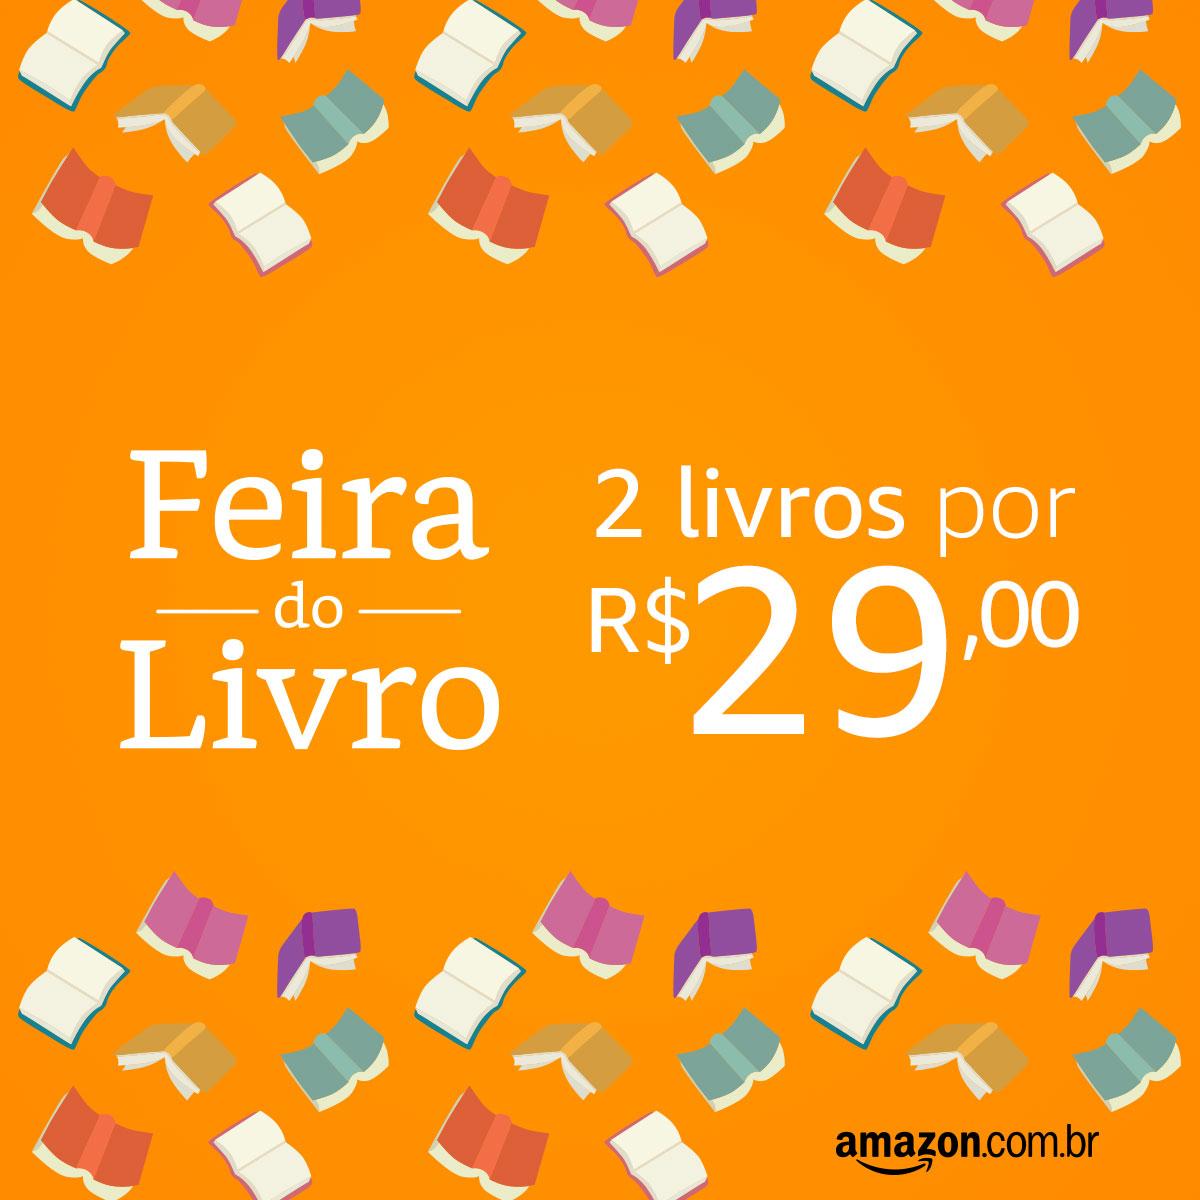 Feira do Livro Amazon